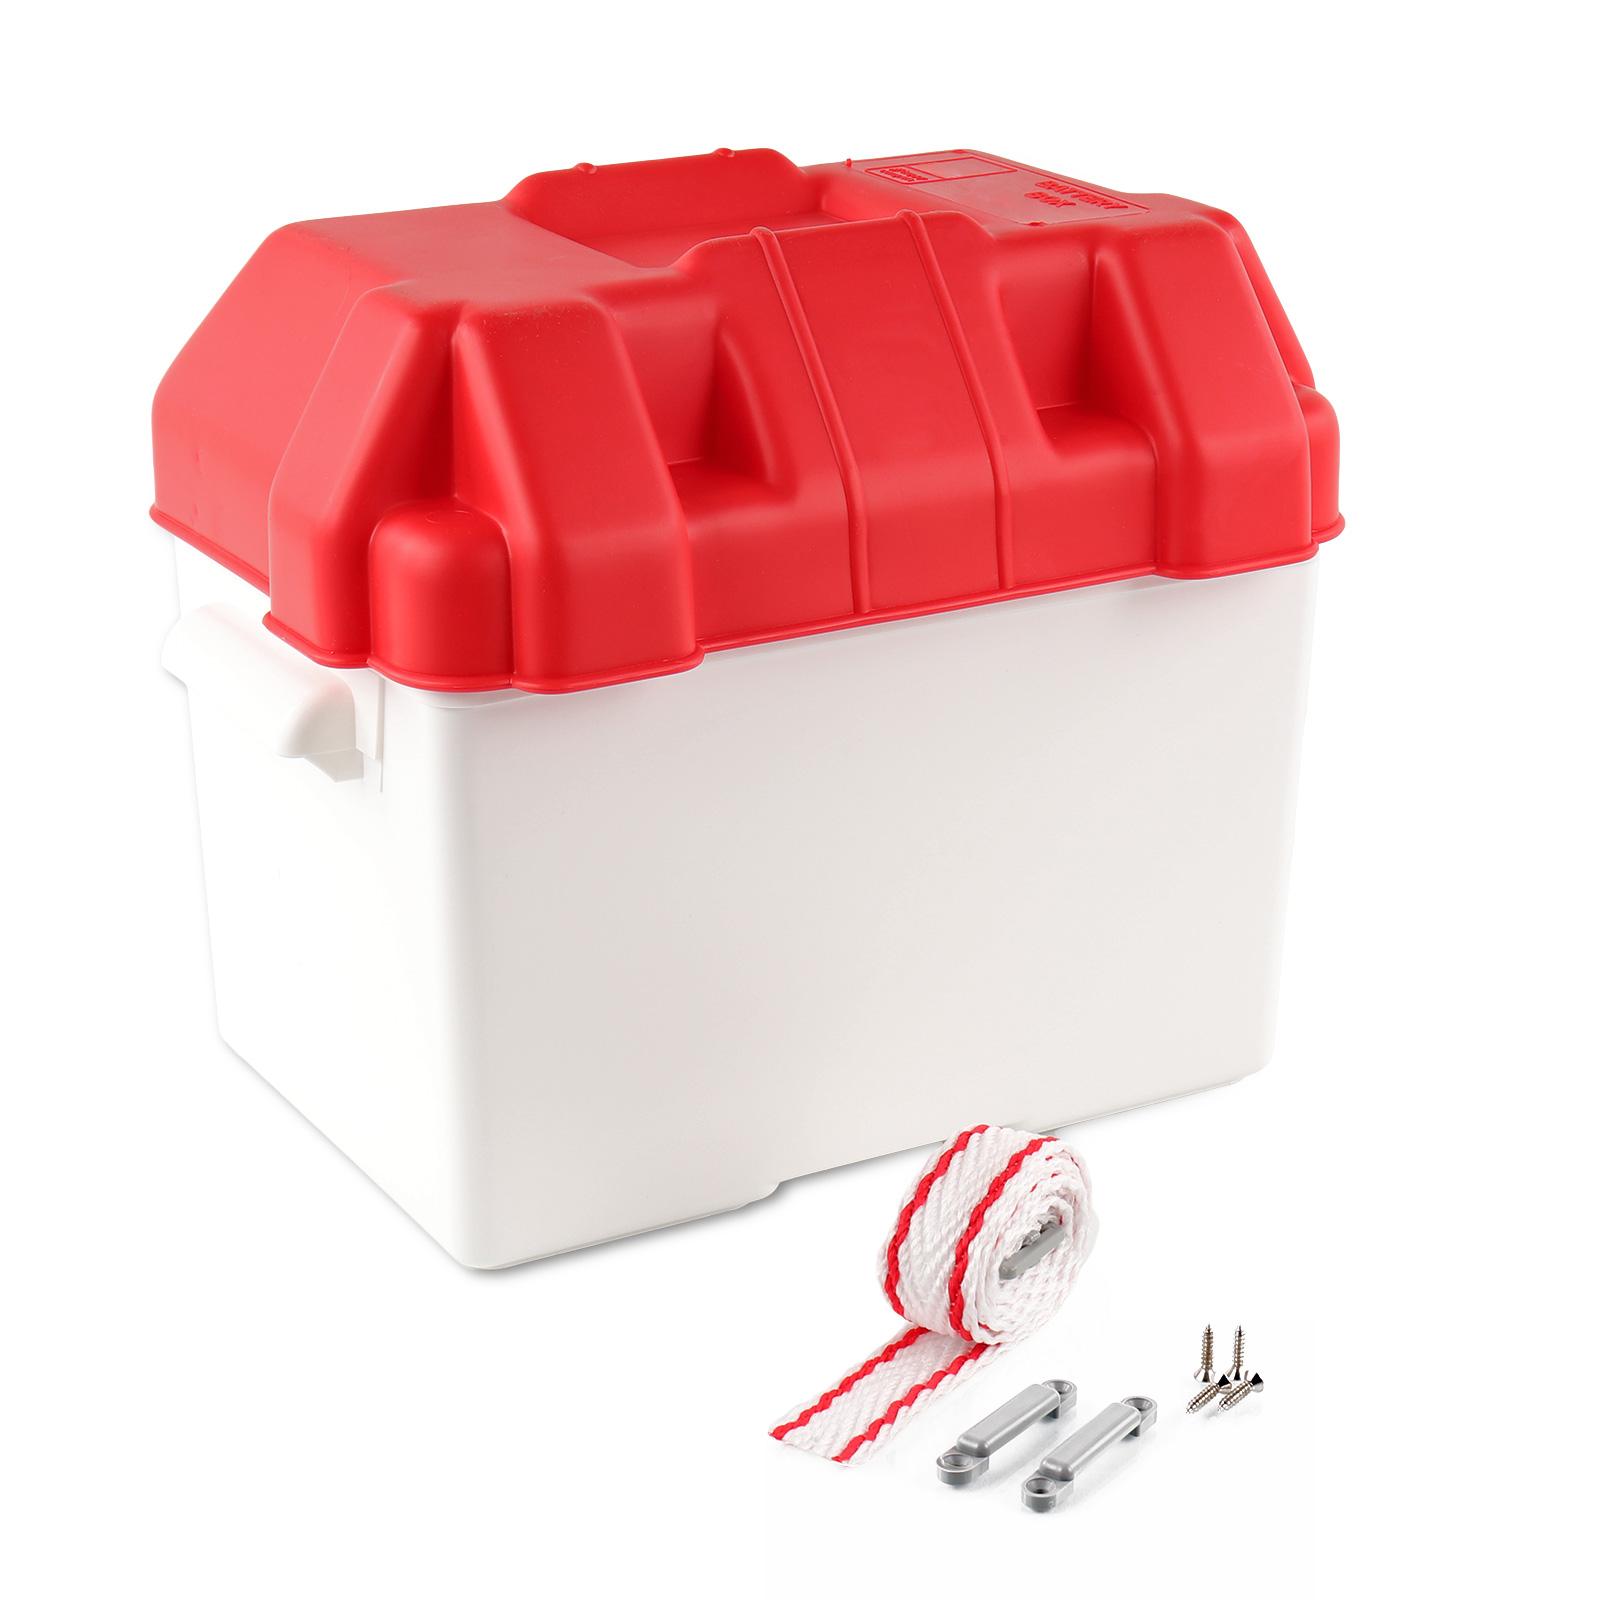 Batteriekasten Batteriebox 312x270x225mm Kunststoff inkl. Halteband